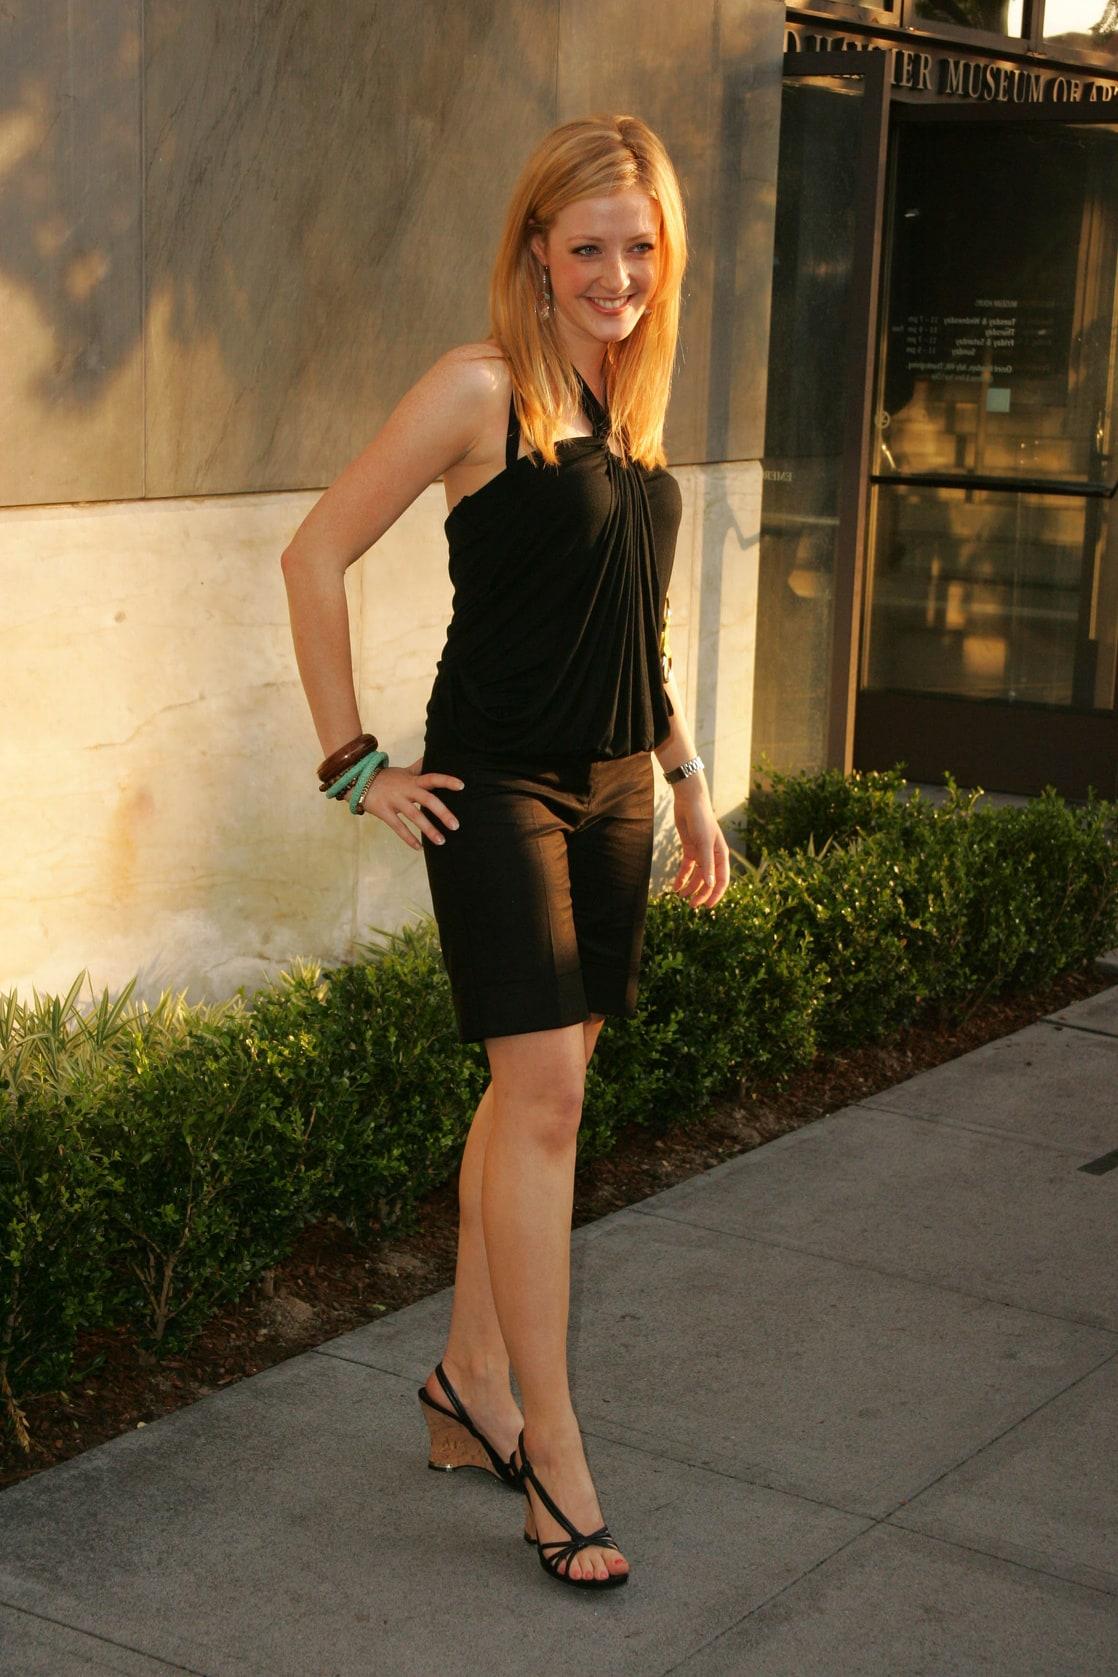 Jennifer Ikeda nudes (98 foto and video), Tits, Sideboobs, Feet, underwear 2006